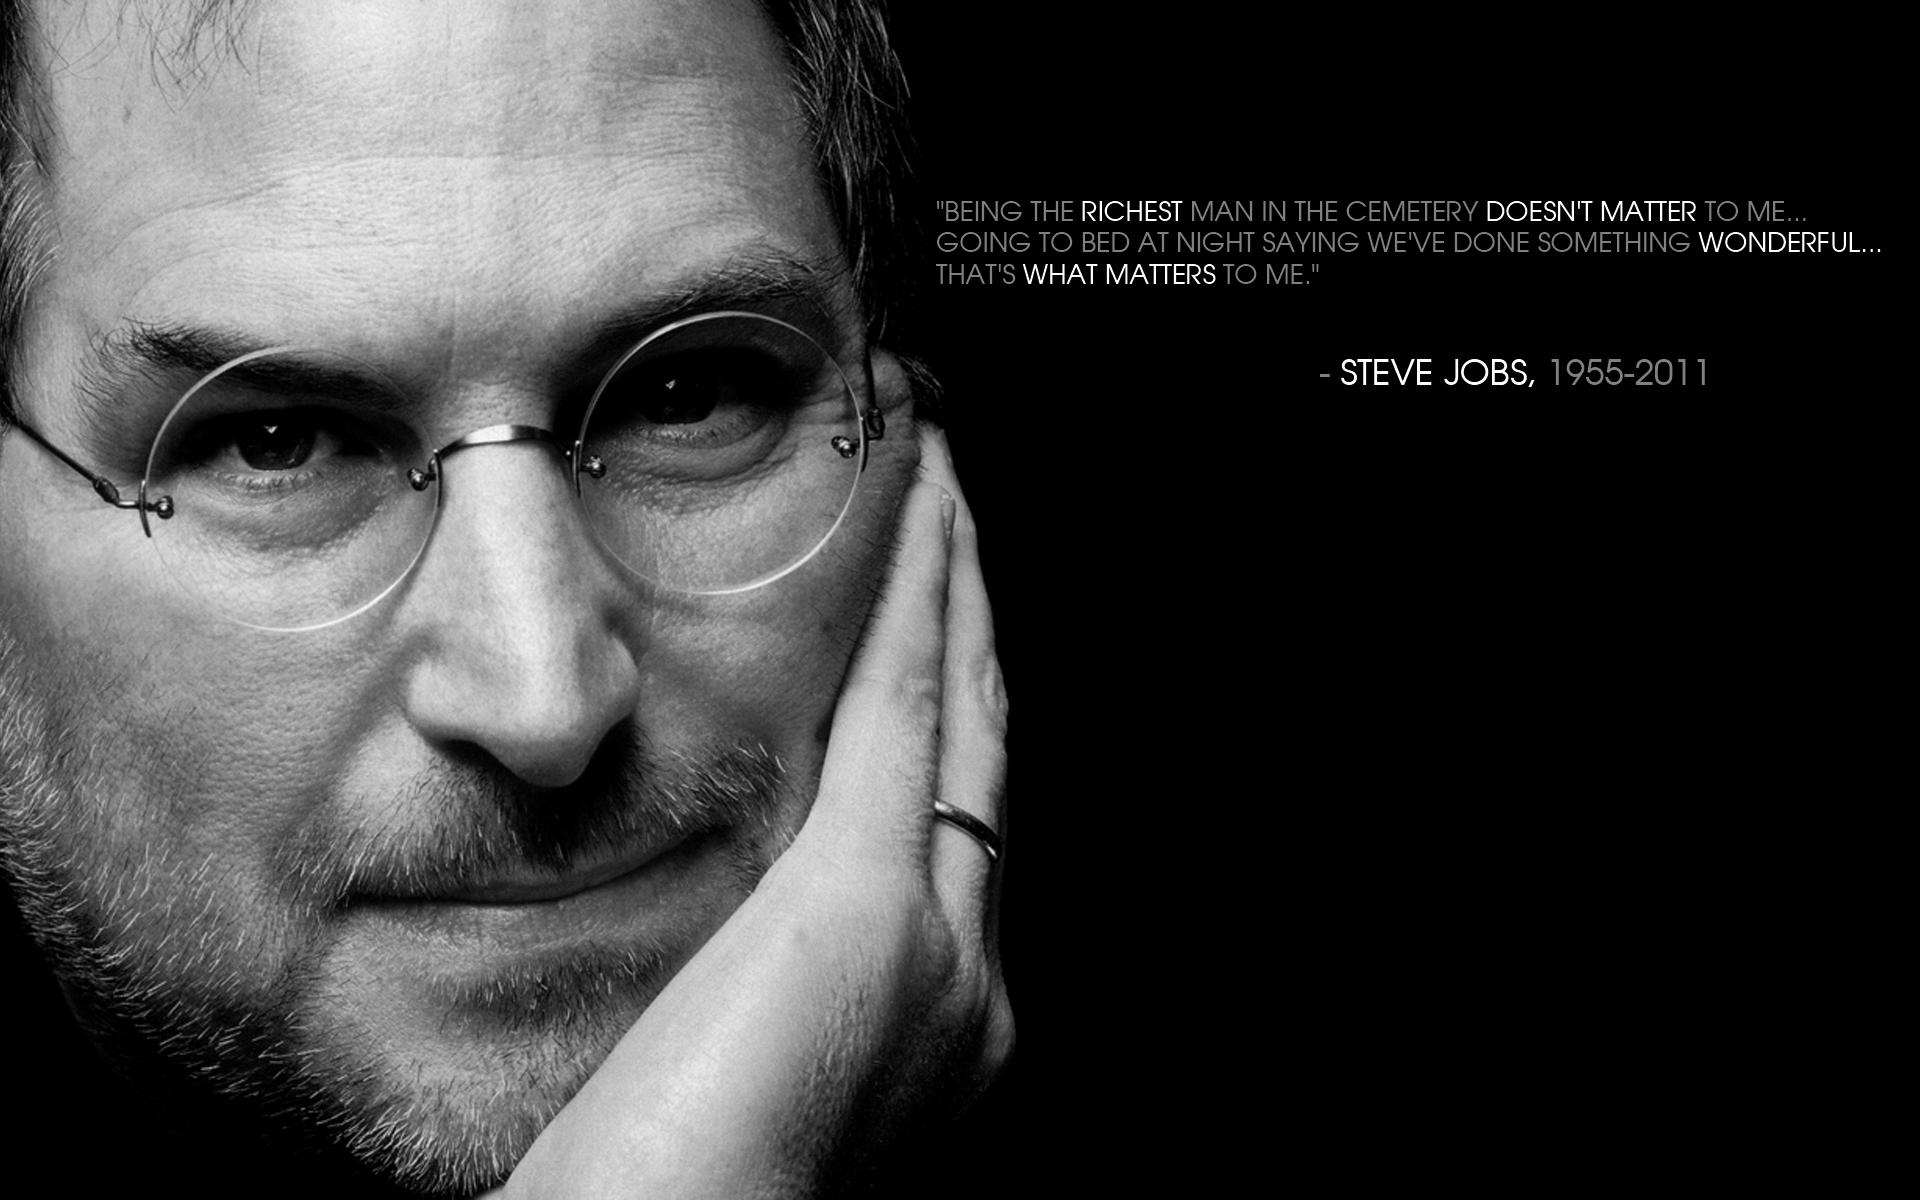 steve-jobs-quote-male-celebrity-hd-wallpaper-1920x1200-2859